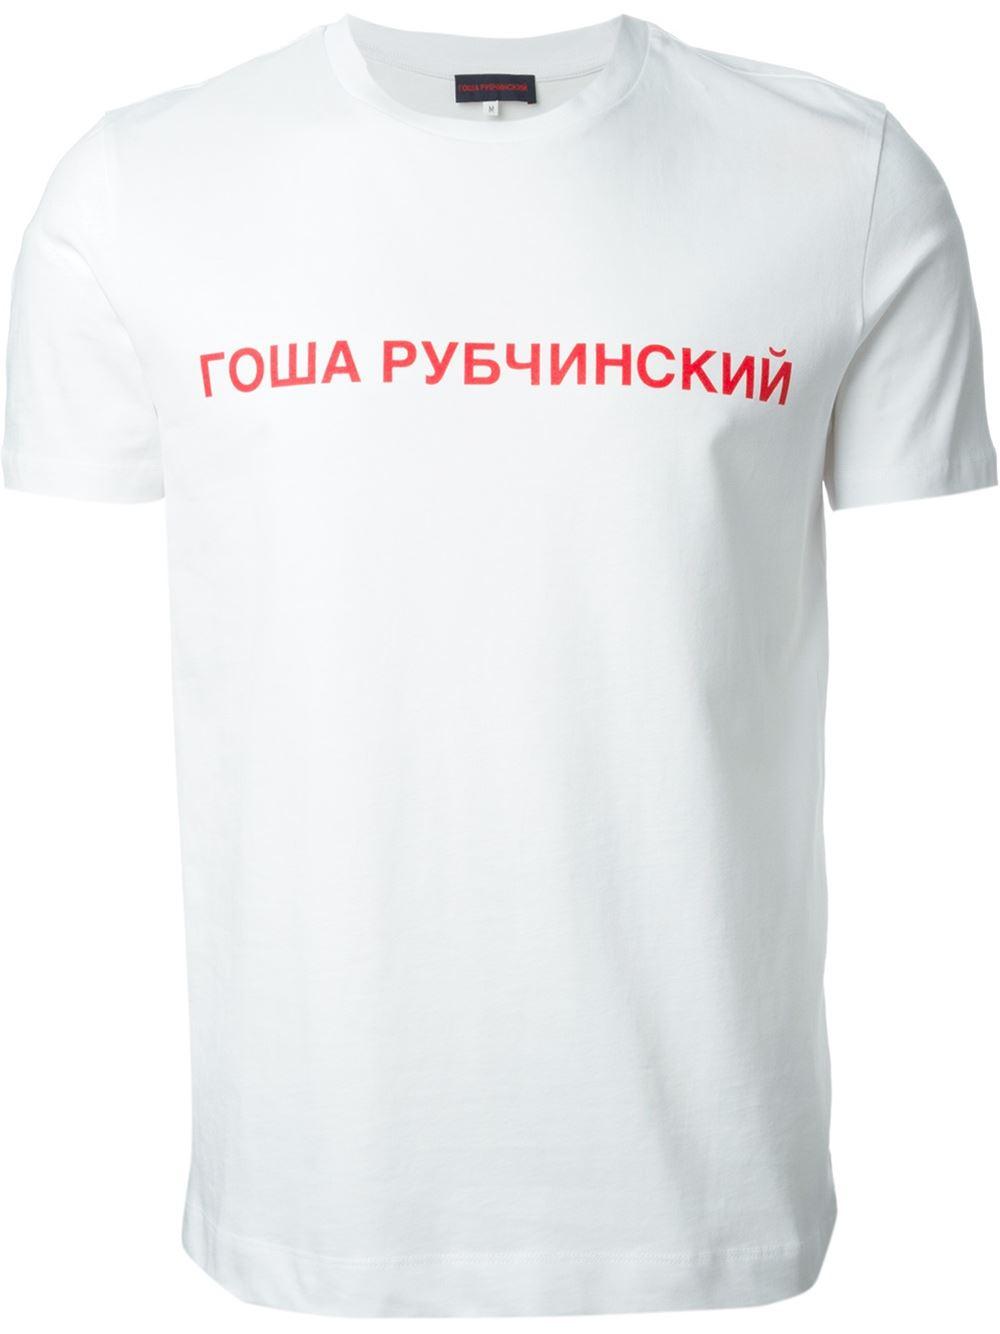 Gosha Rubchinskiy Men S White Cotton Logo T Shirt In White